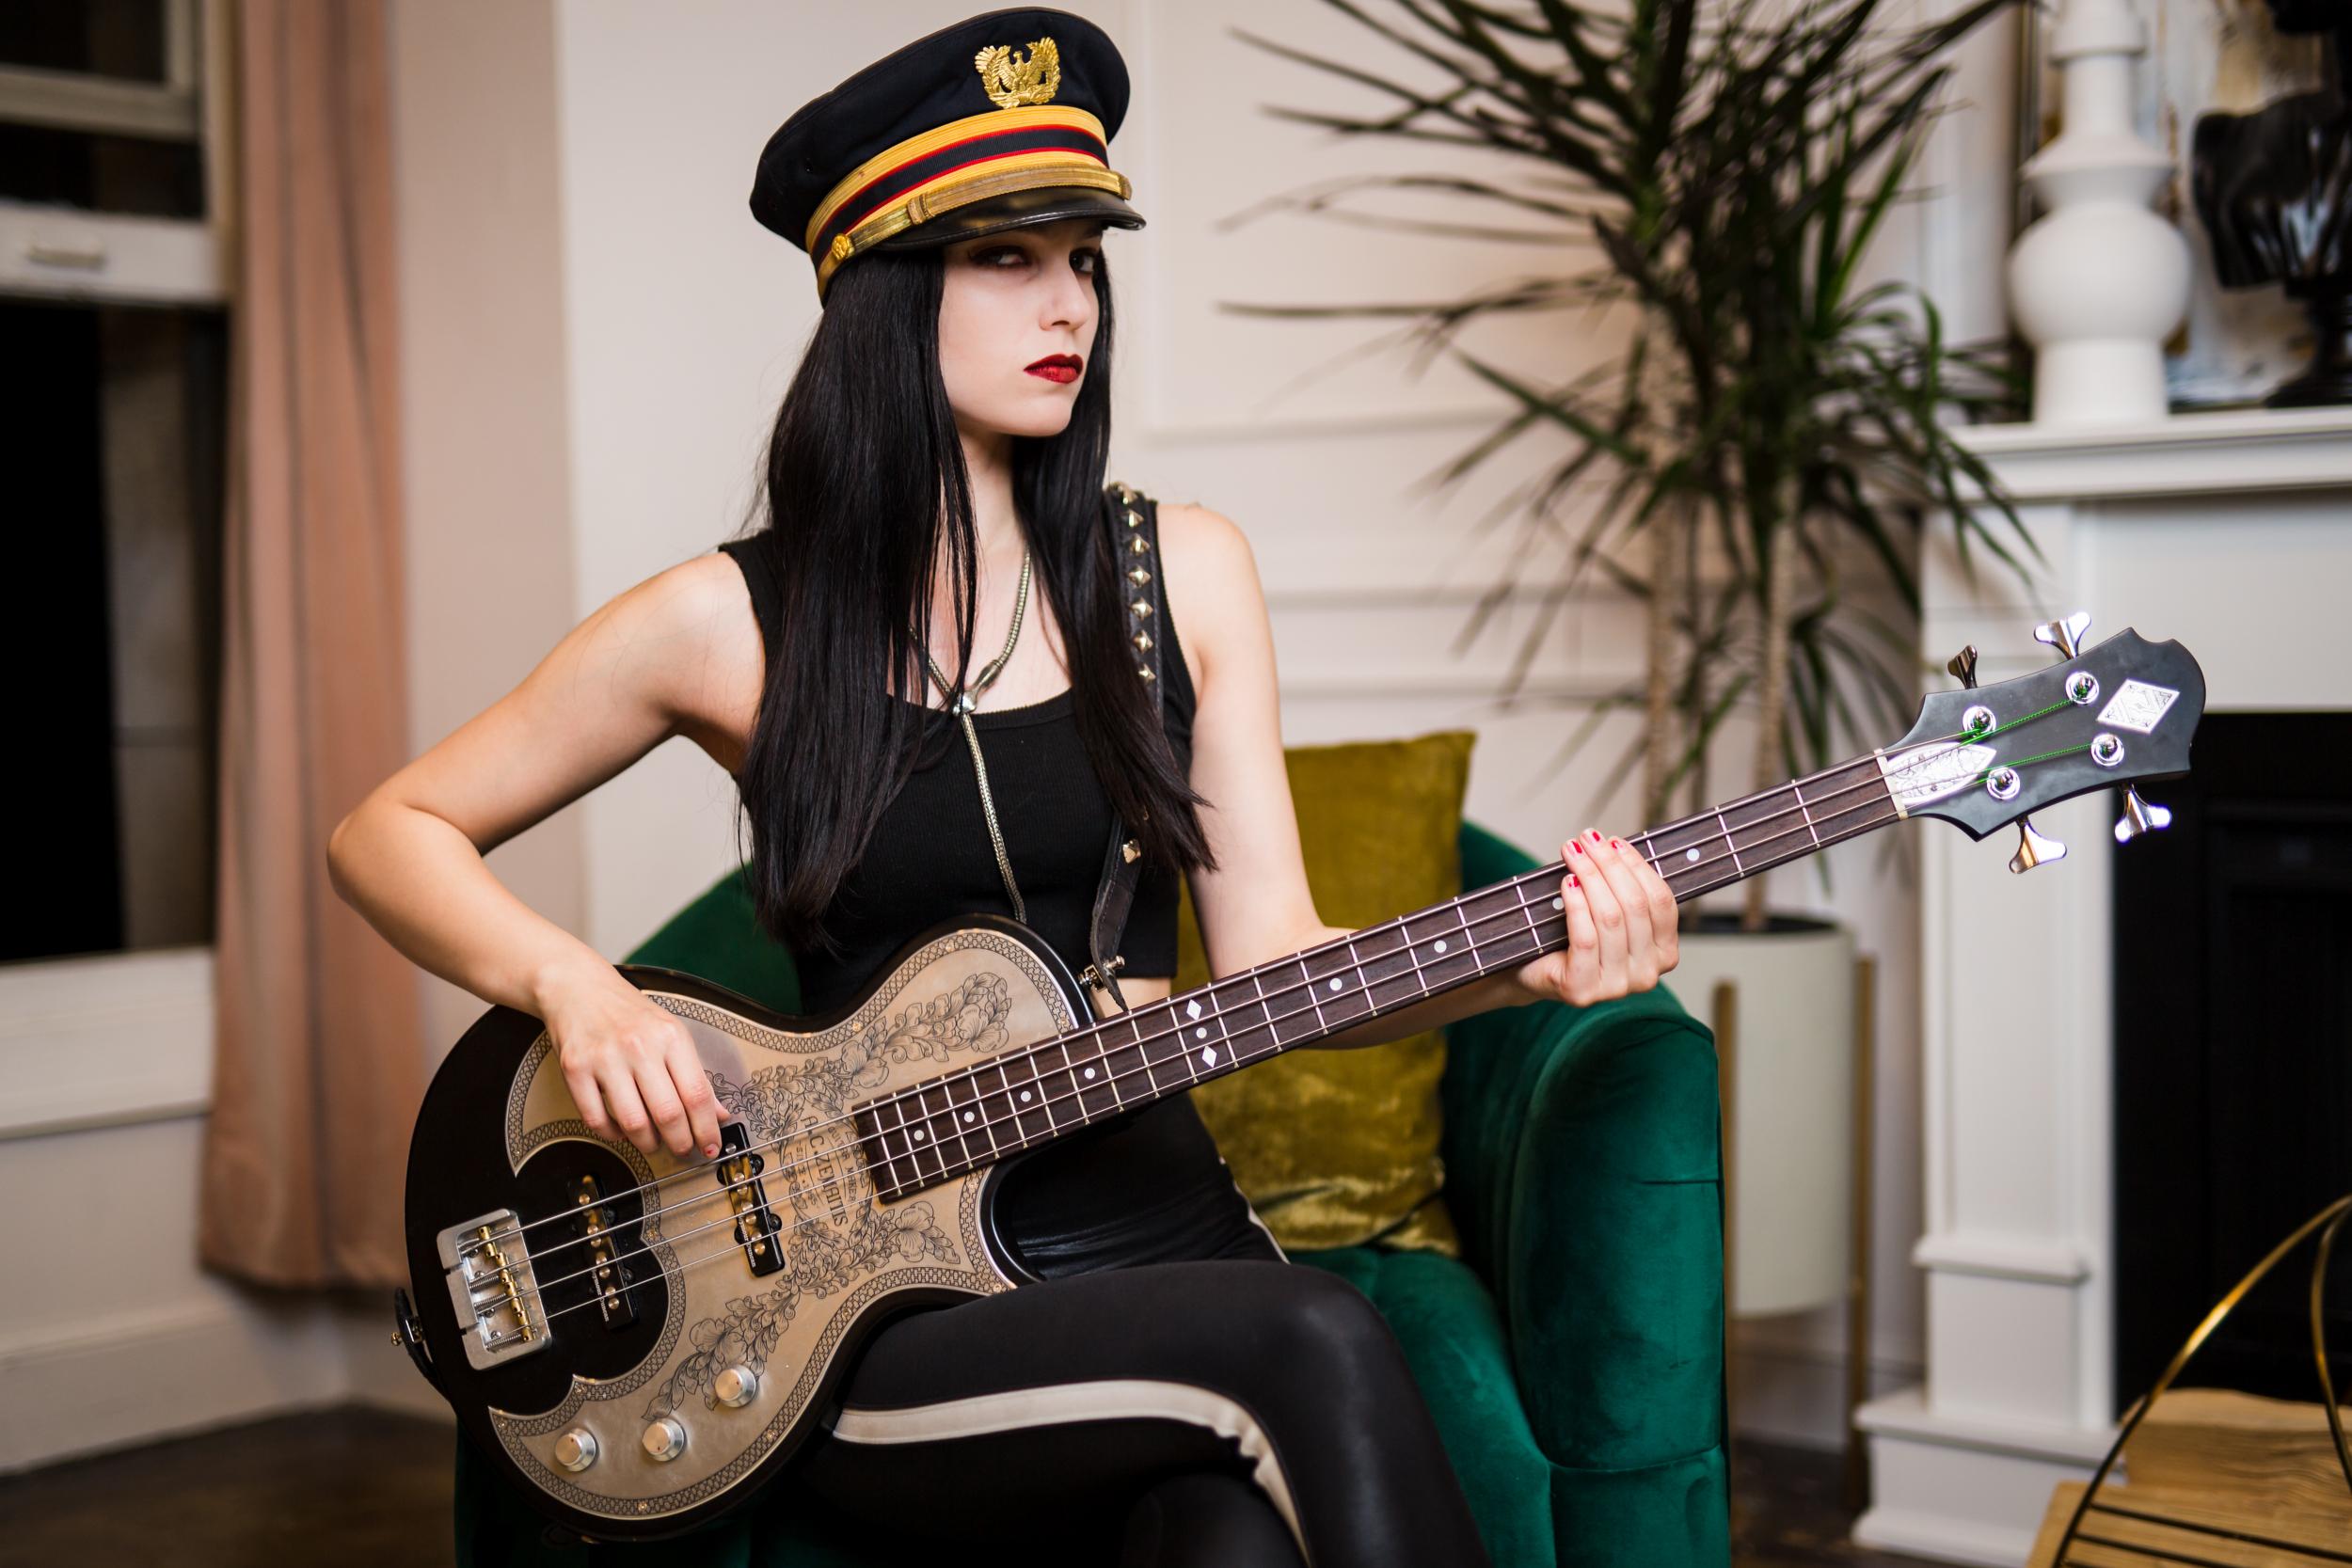 girl sitting down holding guitar